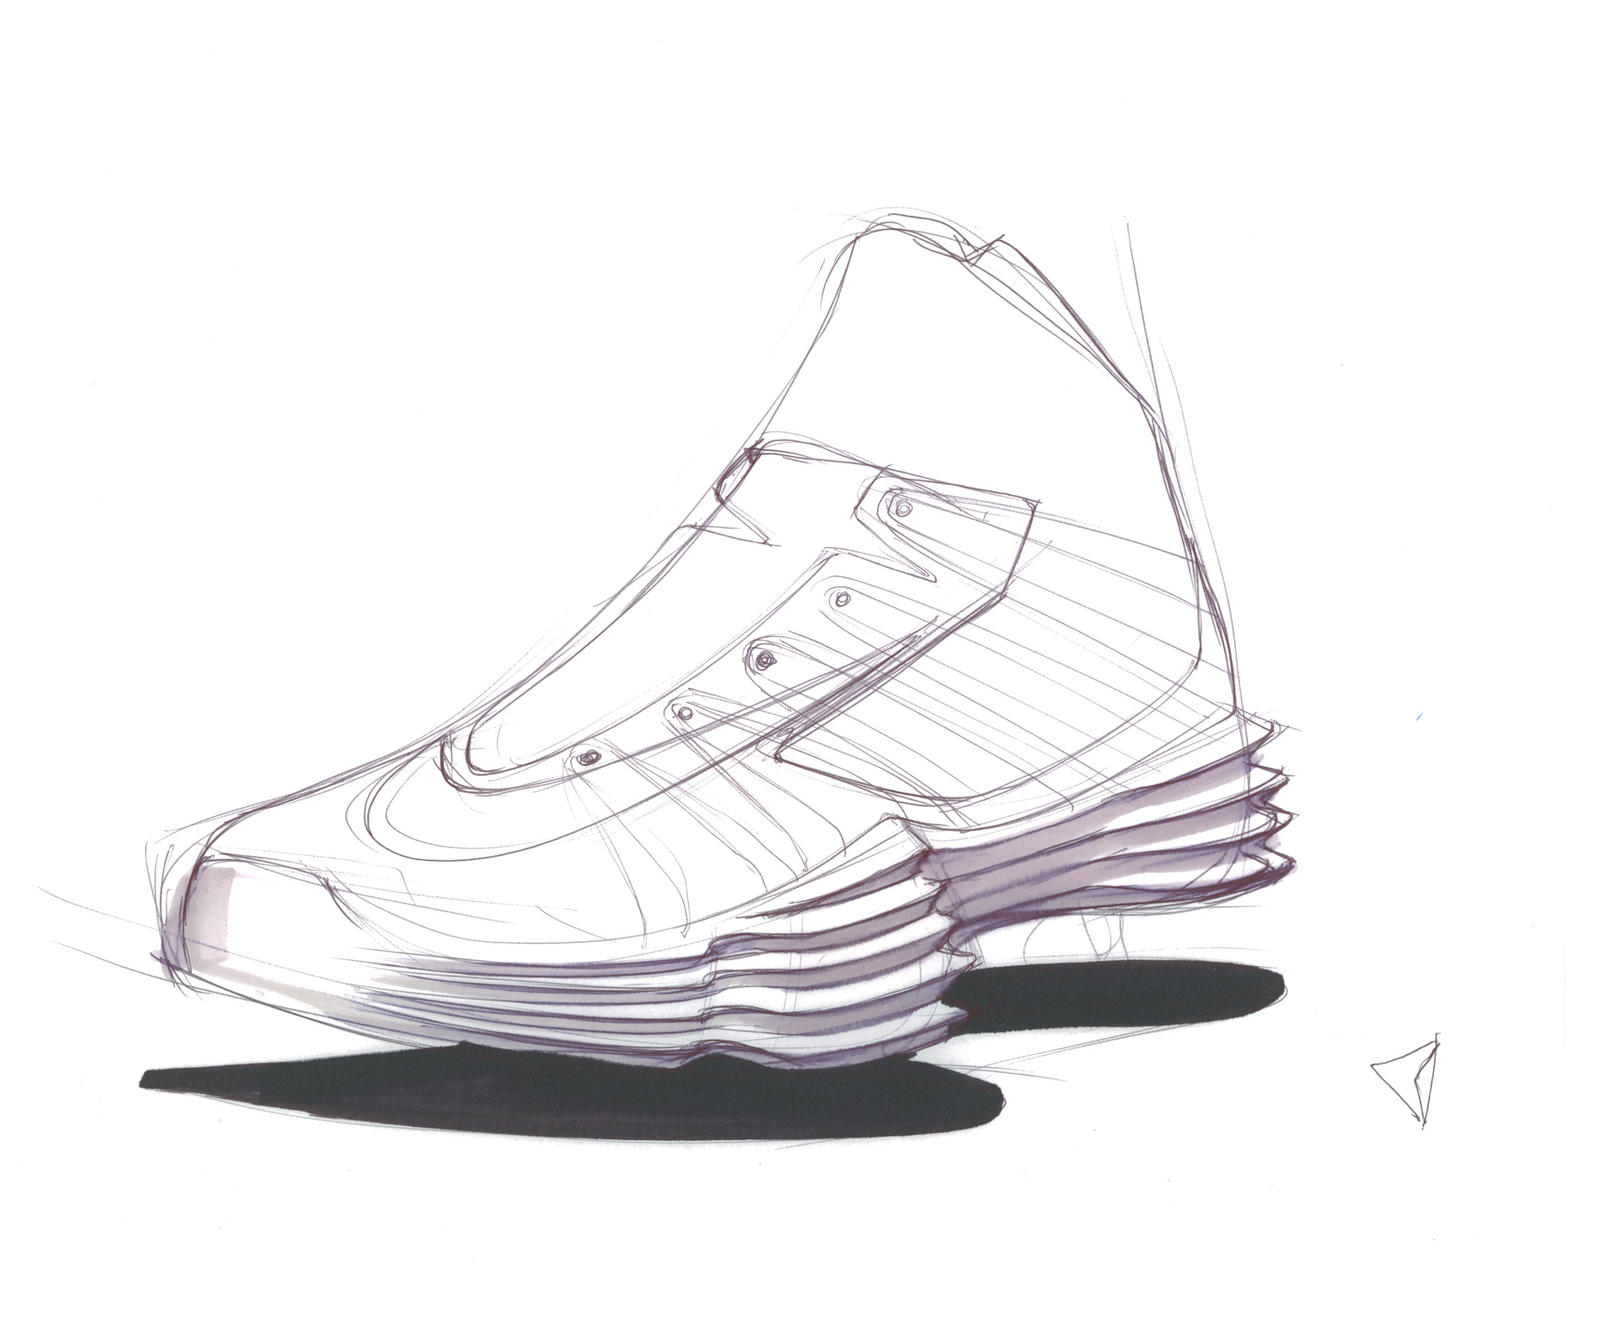 Drawn shoe design sketch basketball Image Gallery Nike design Mobile